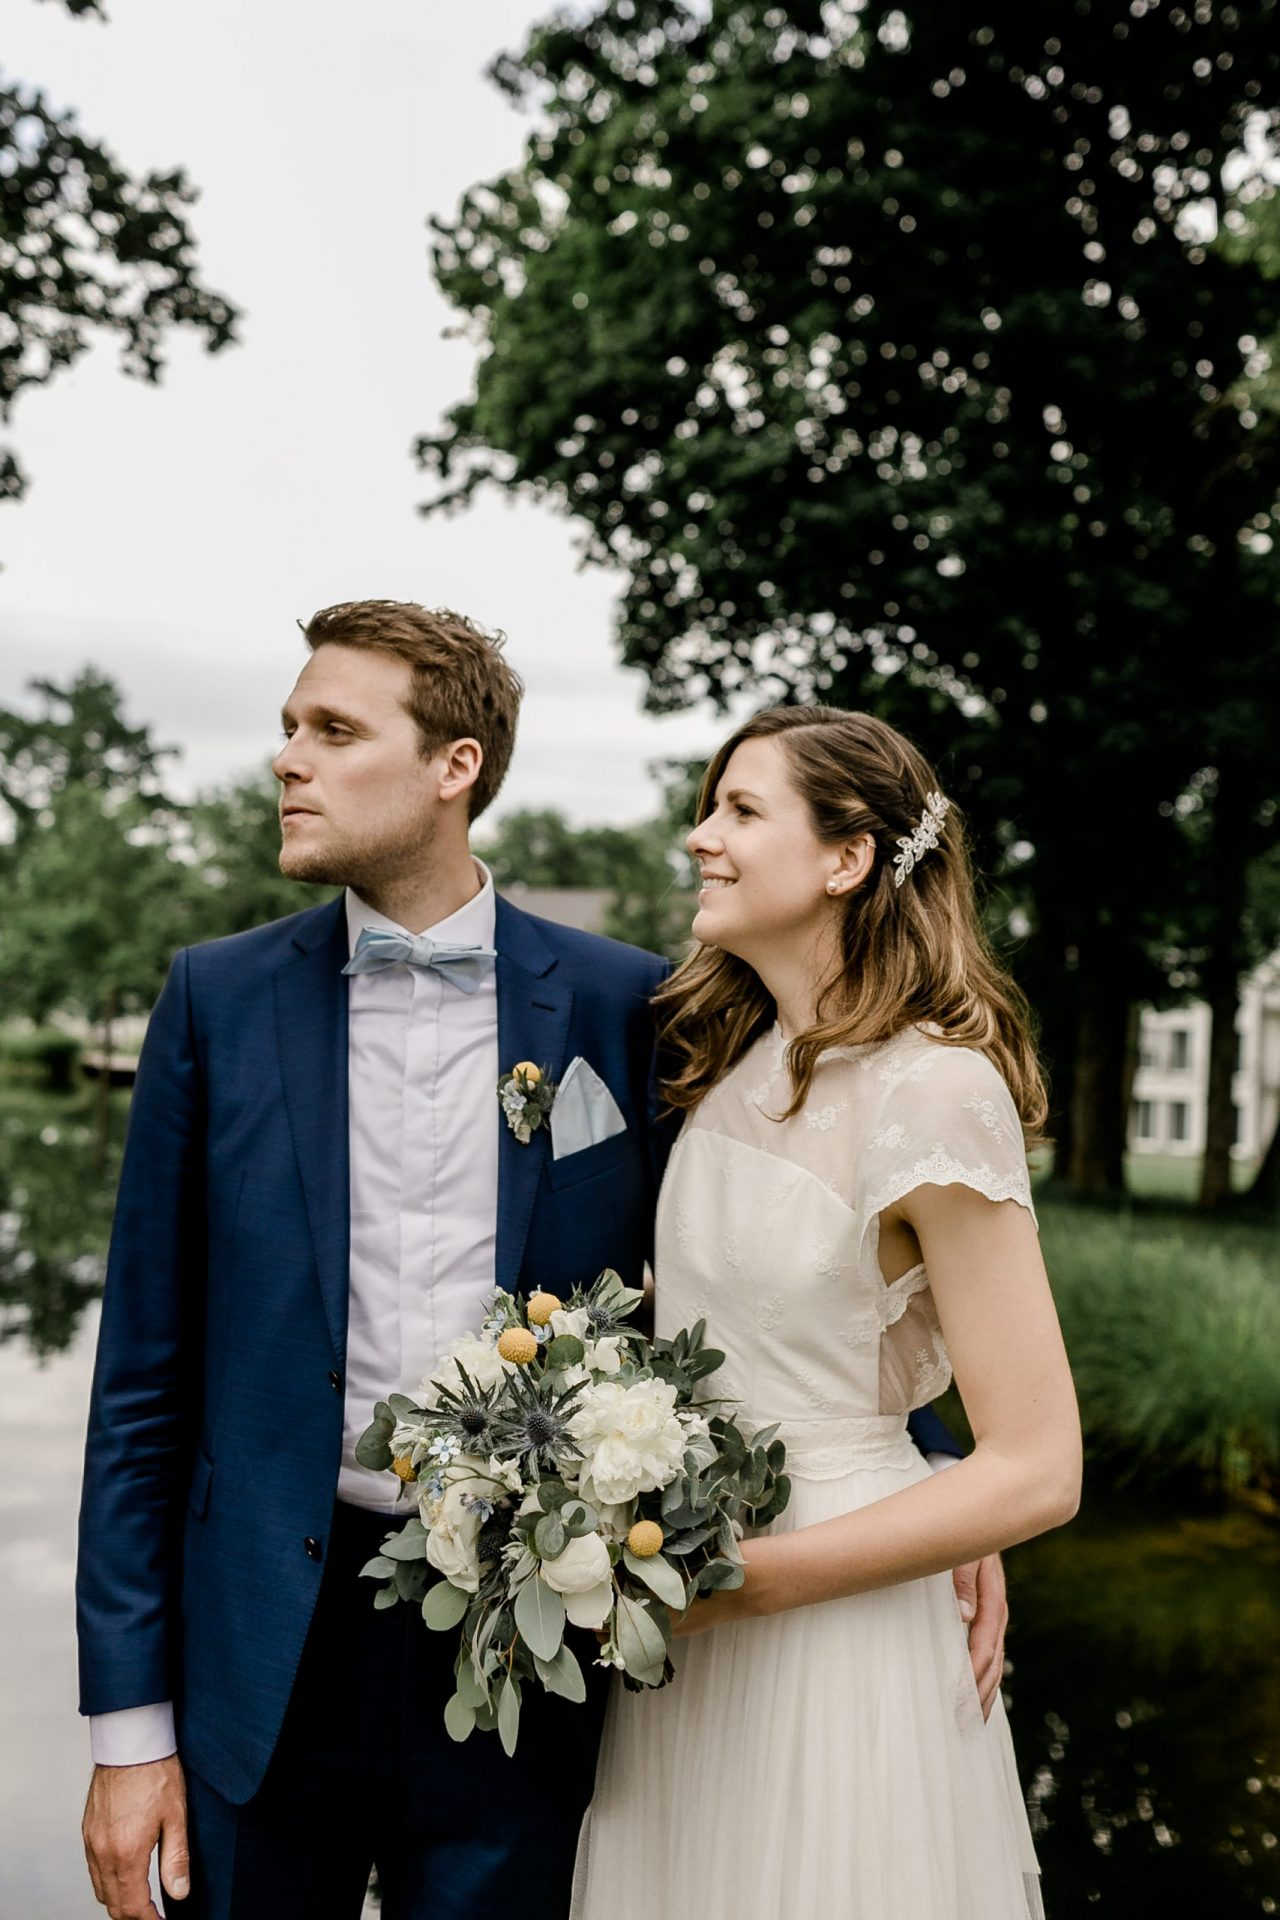 Brautpaar vor Landschaft